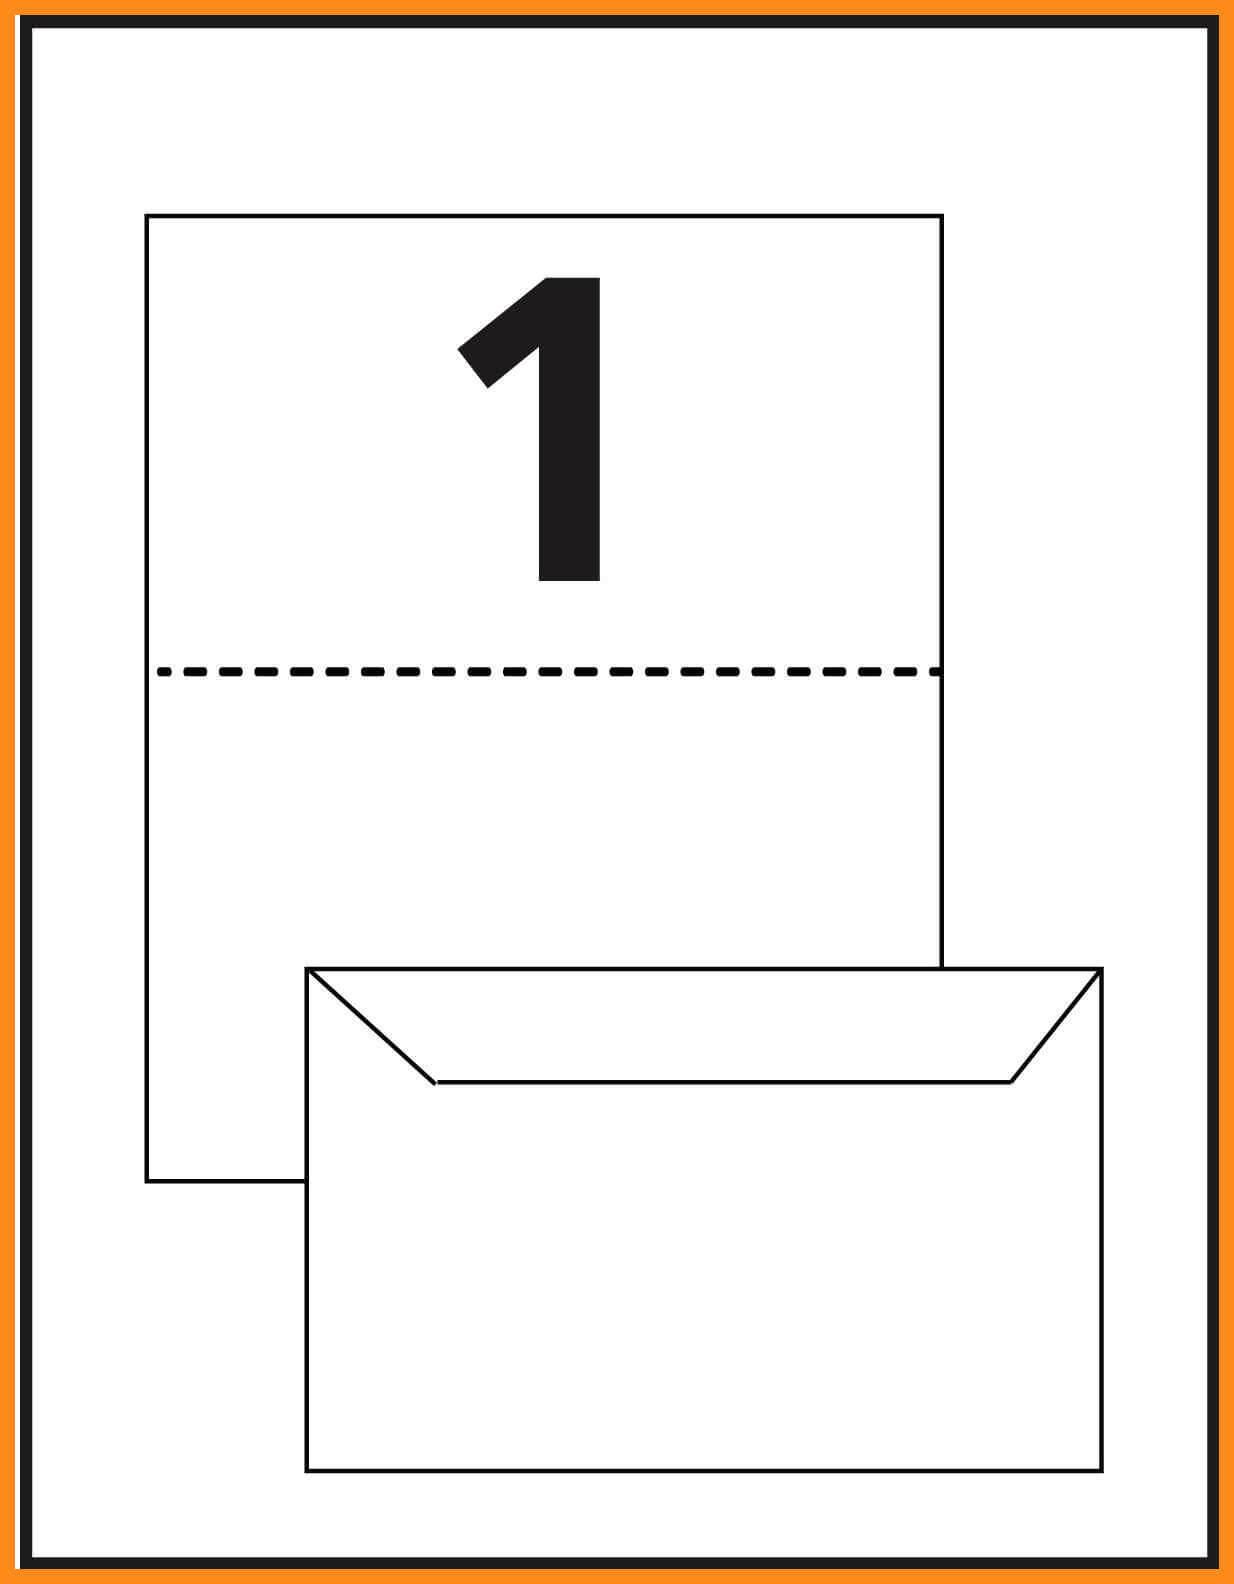 12-13 Blank Quarter Fold Card Template | Lascazuelasphilly inside Blank Quarter Fold Card Template